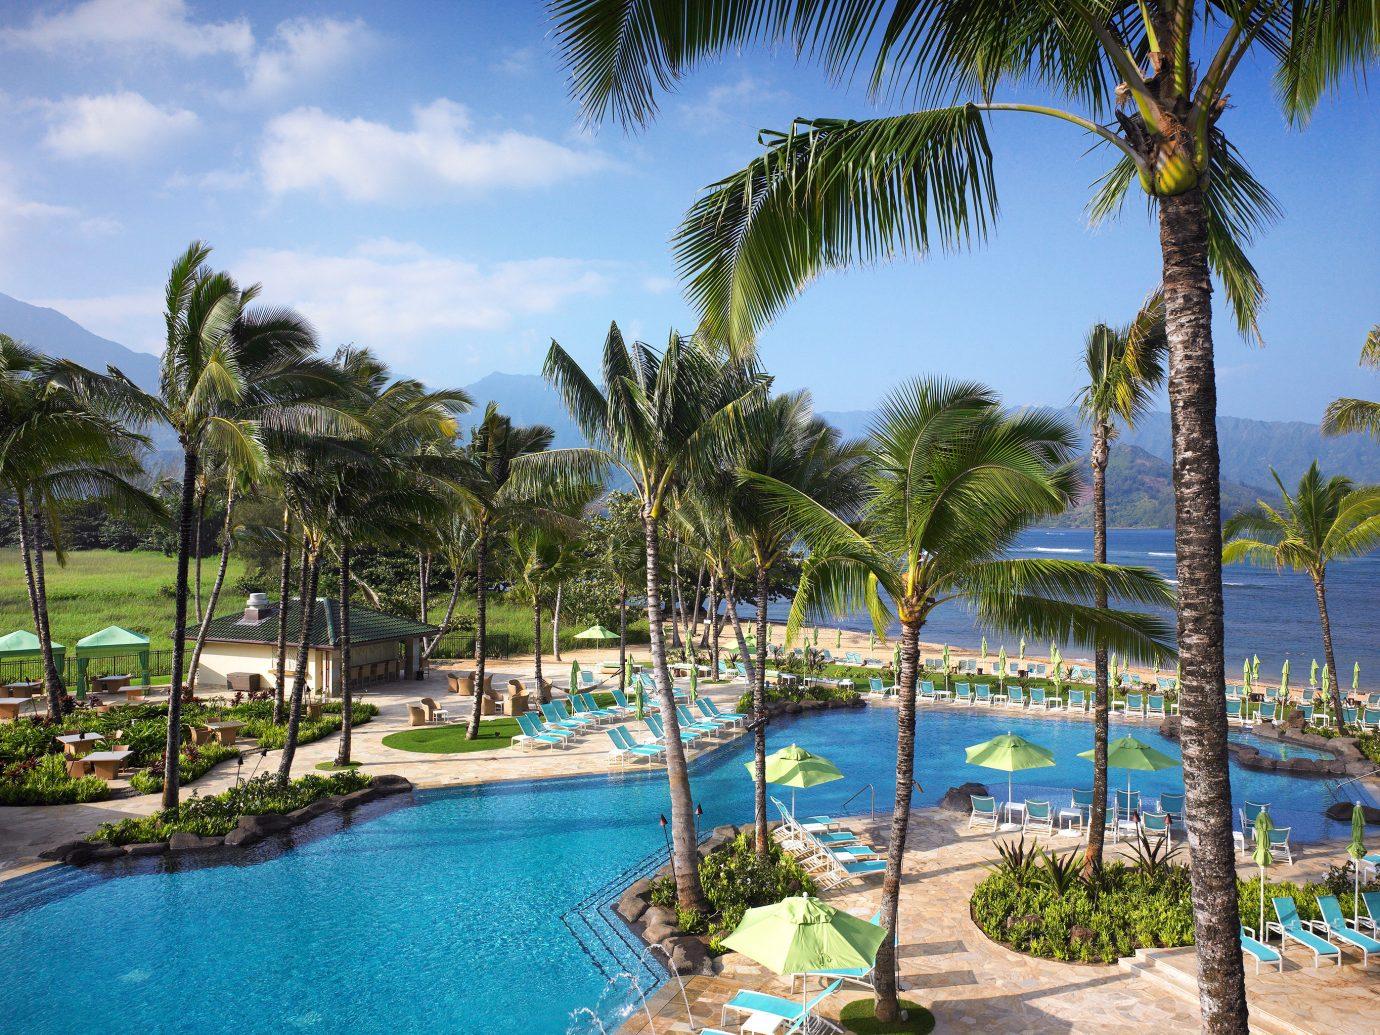 St. Regis Princeville Resort, Kauai